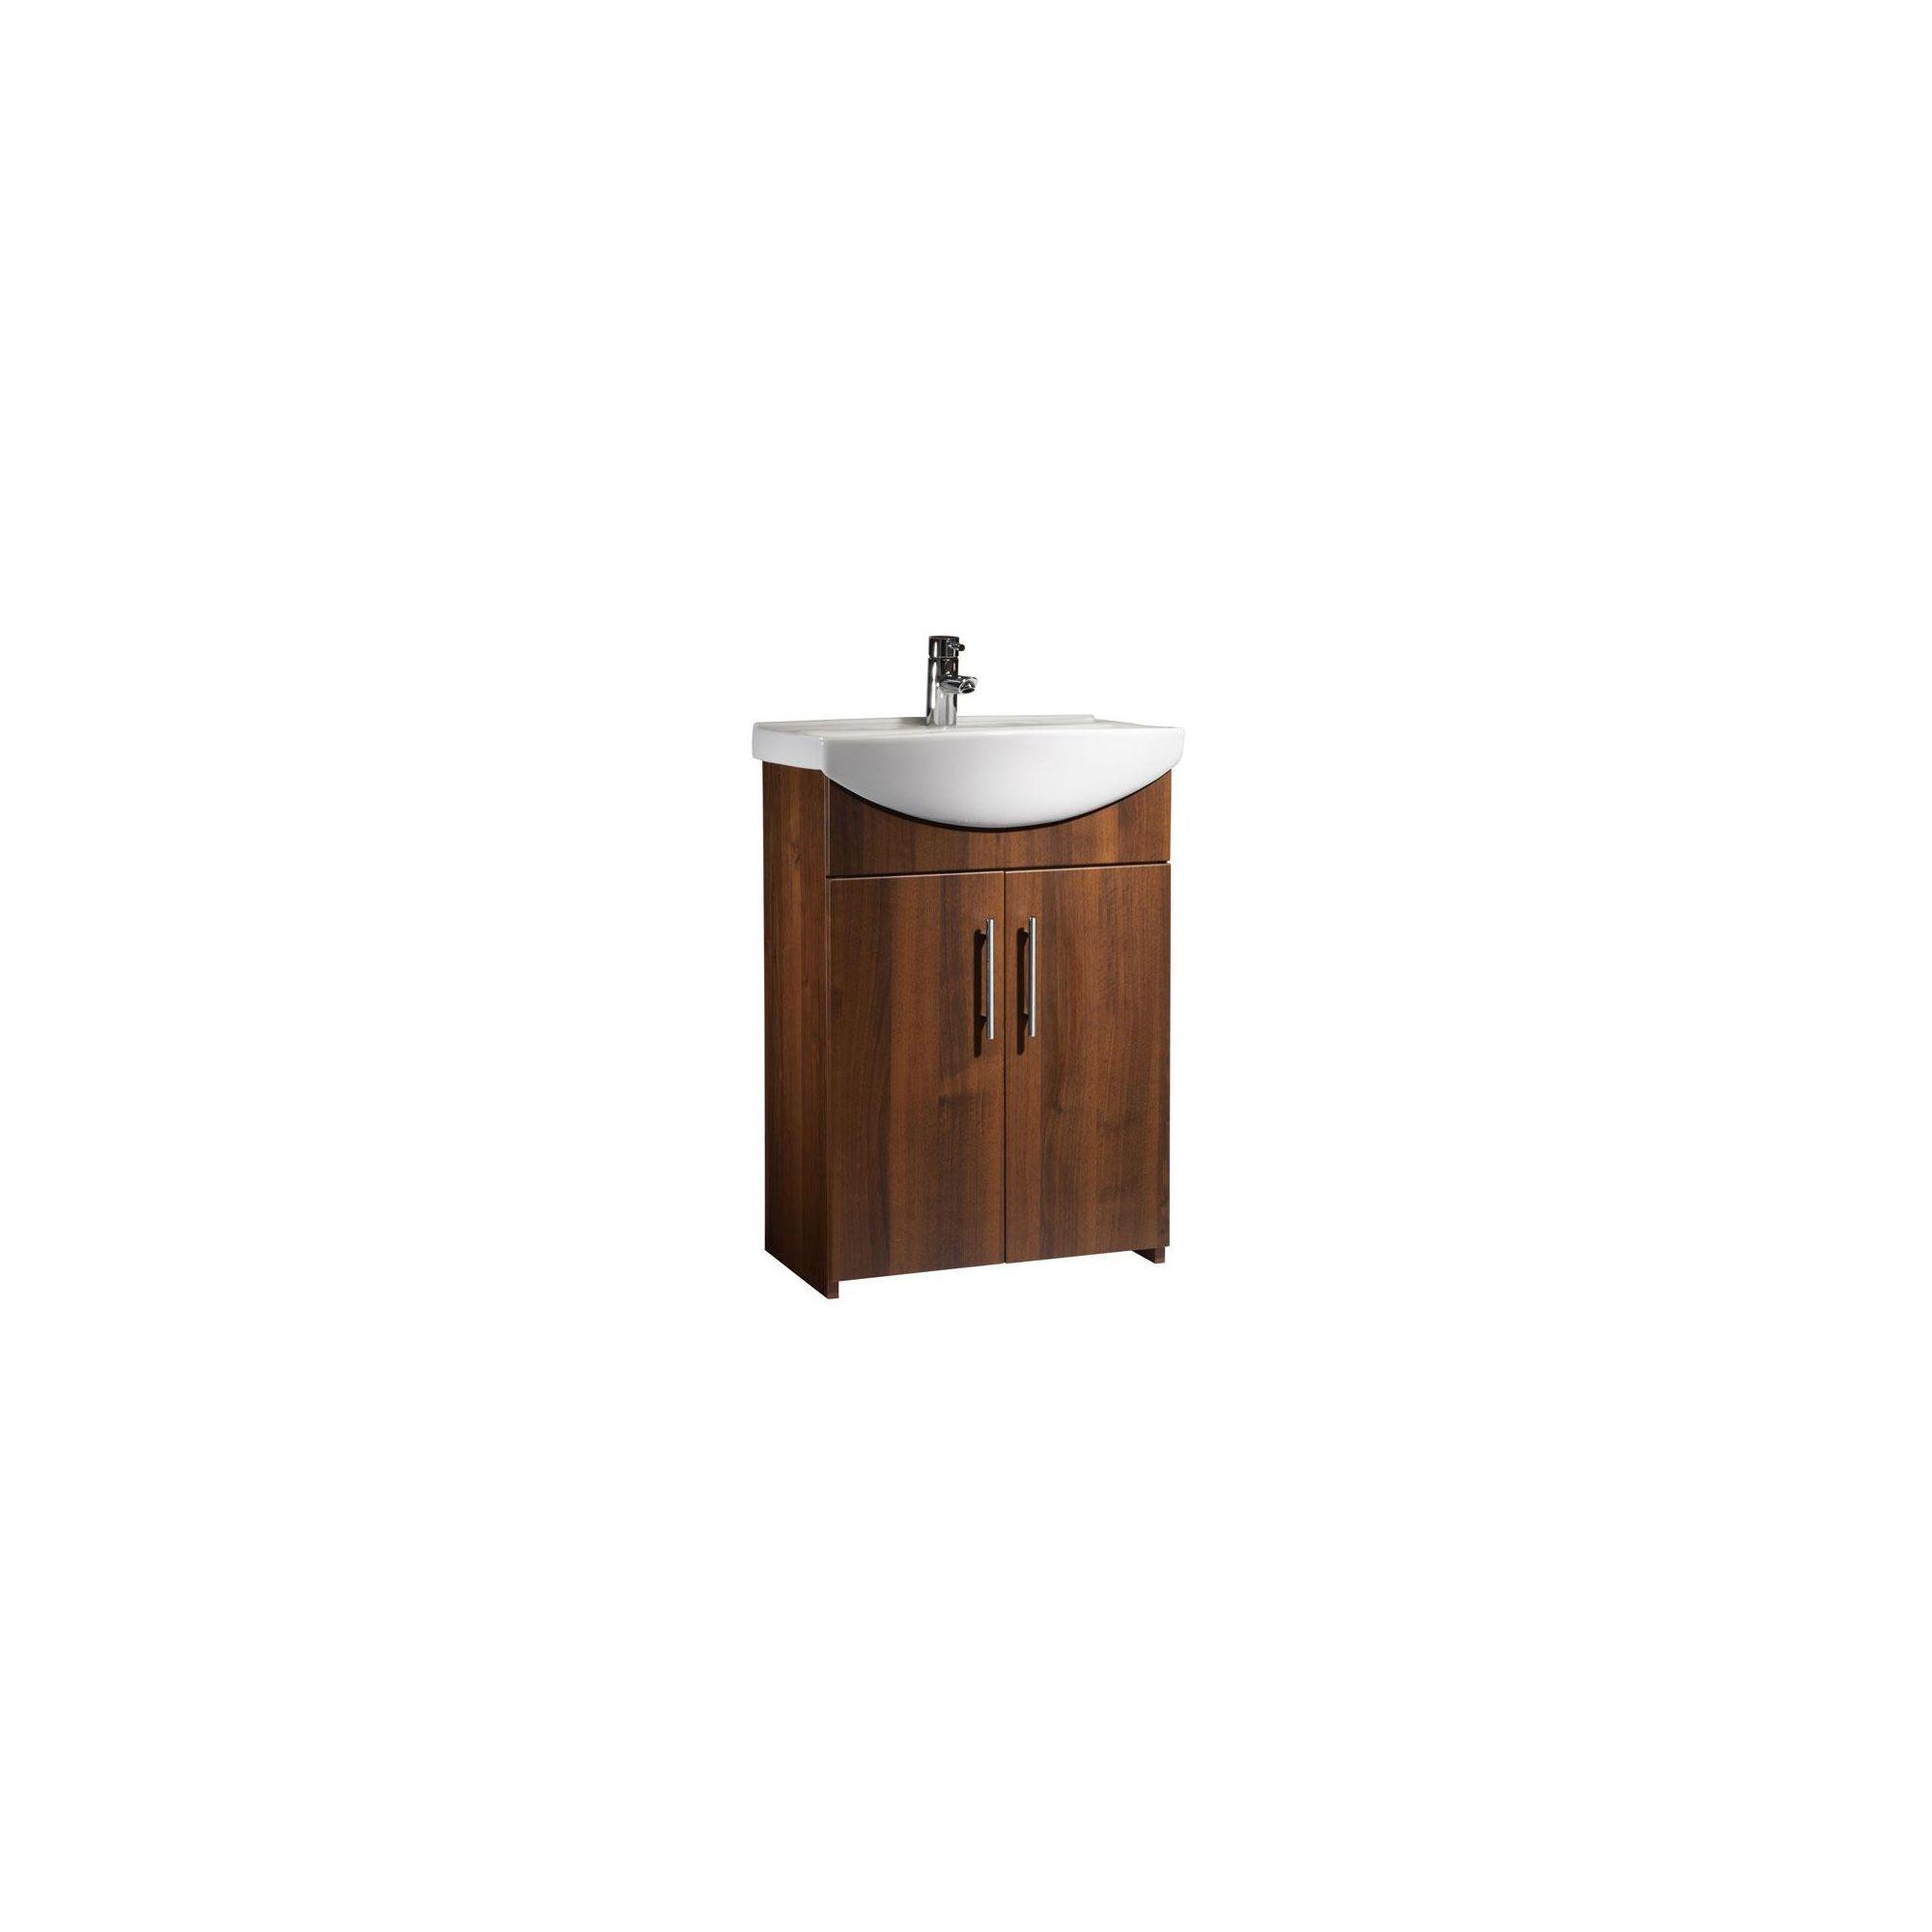 Tavistock Opal Walnut Floor Standing Cabinet and Basin - 1 Tap Hole - 600mm Wide